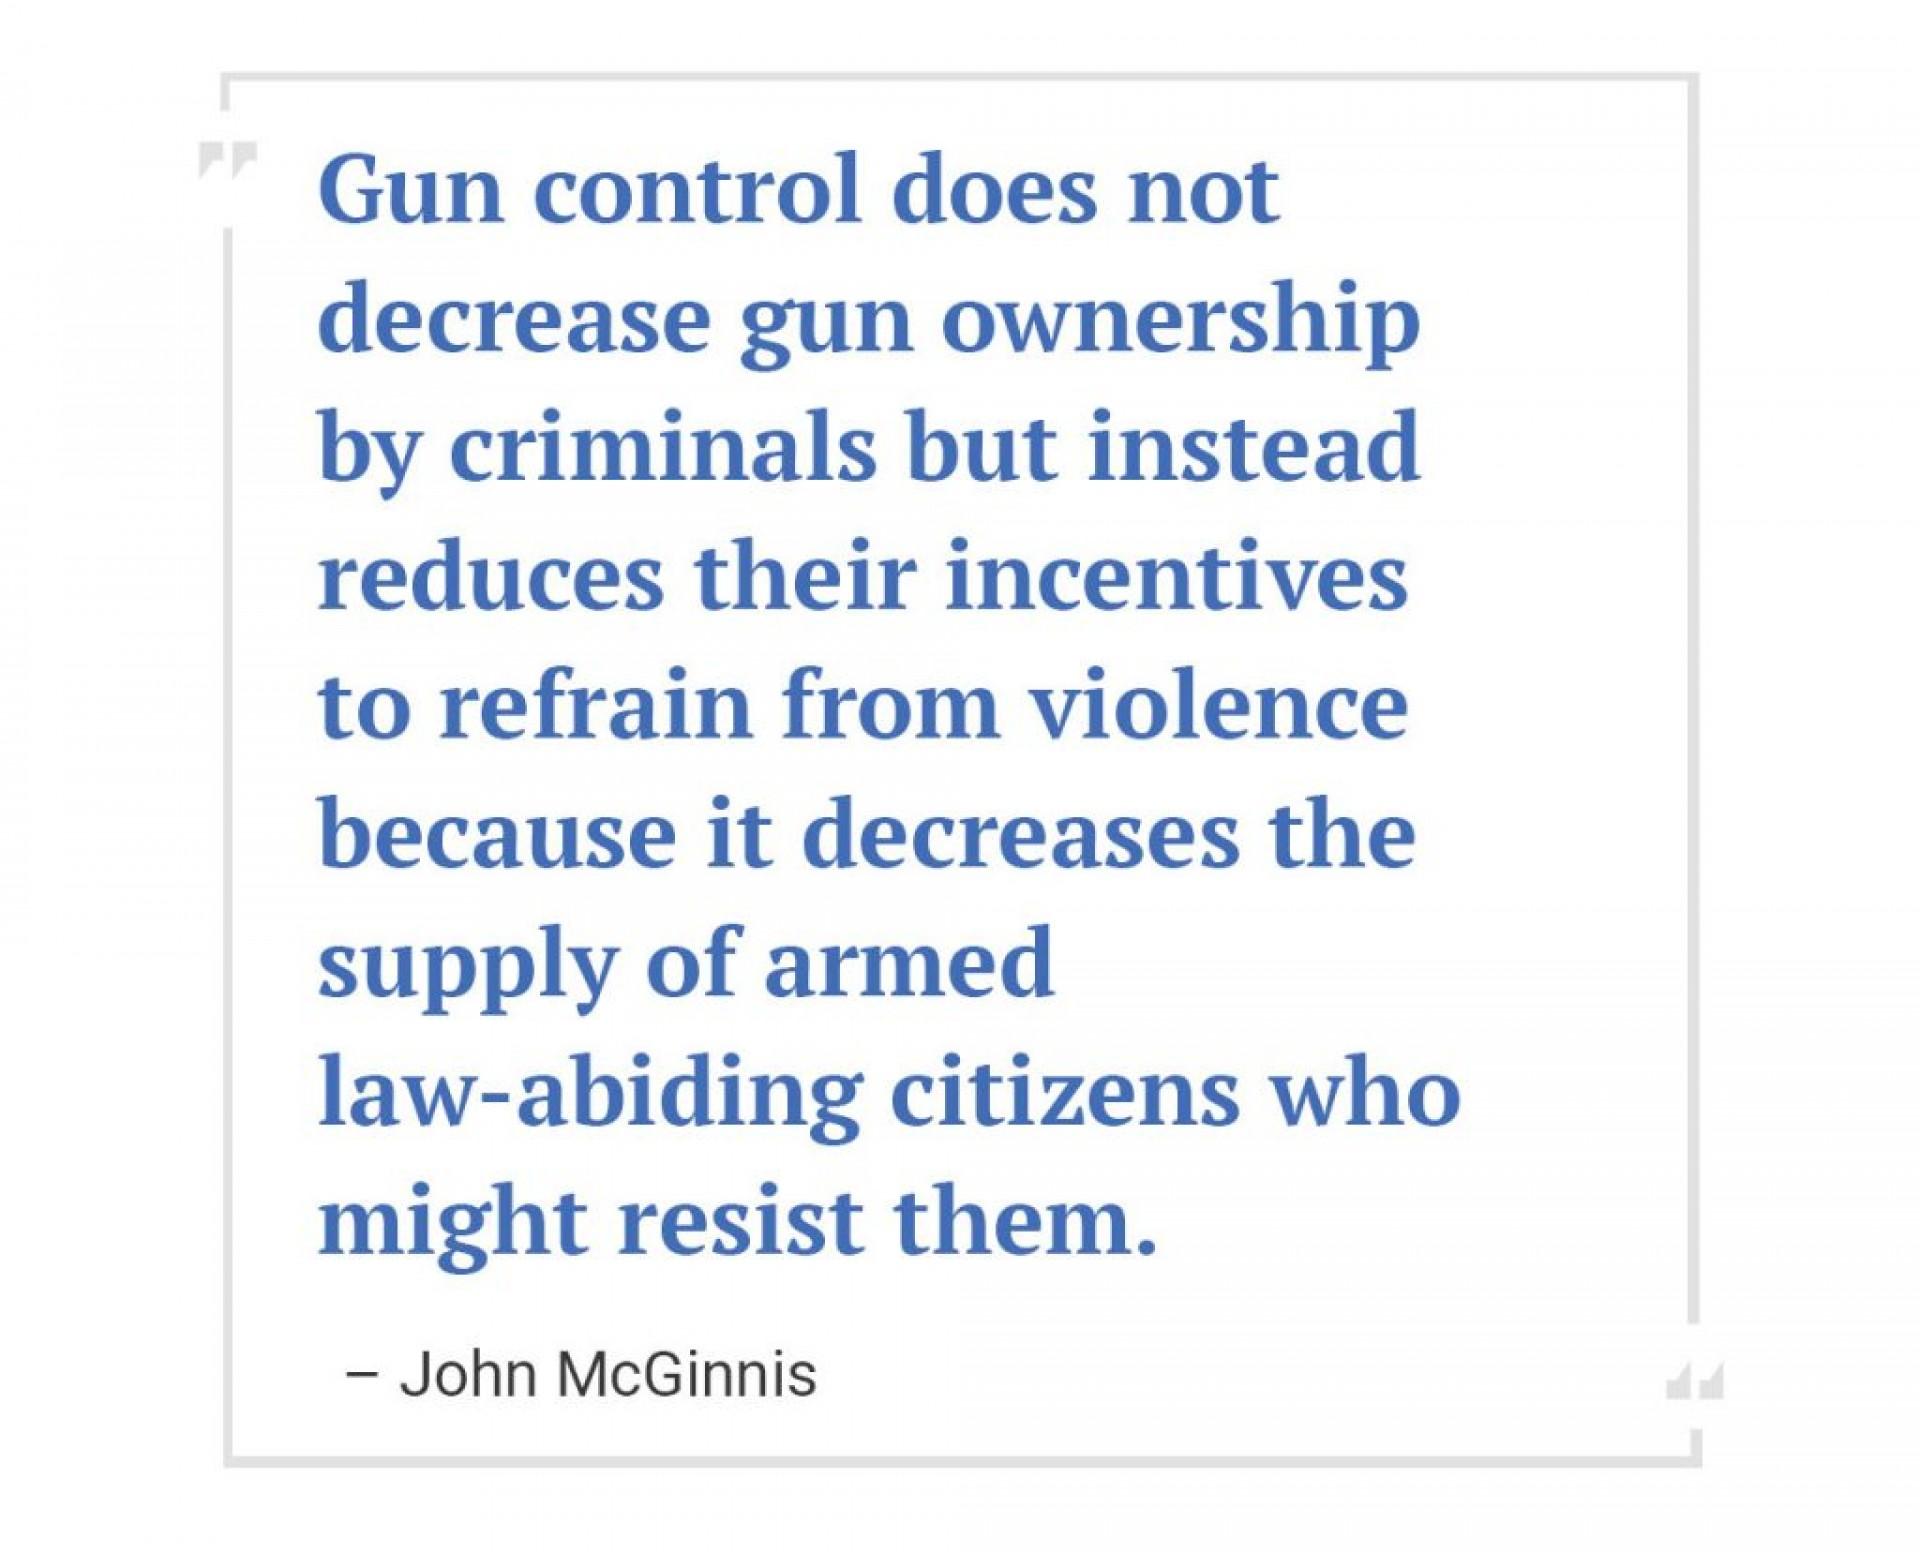 001 Essay Example On Gun Control John Mcginnis Incredible Laws Against 1920